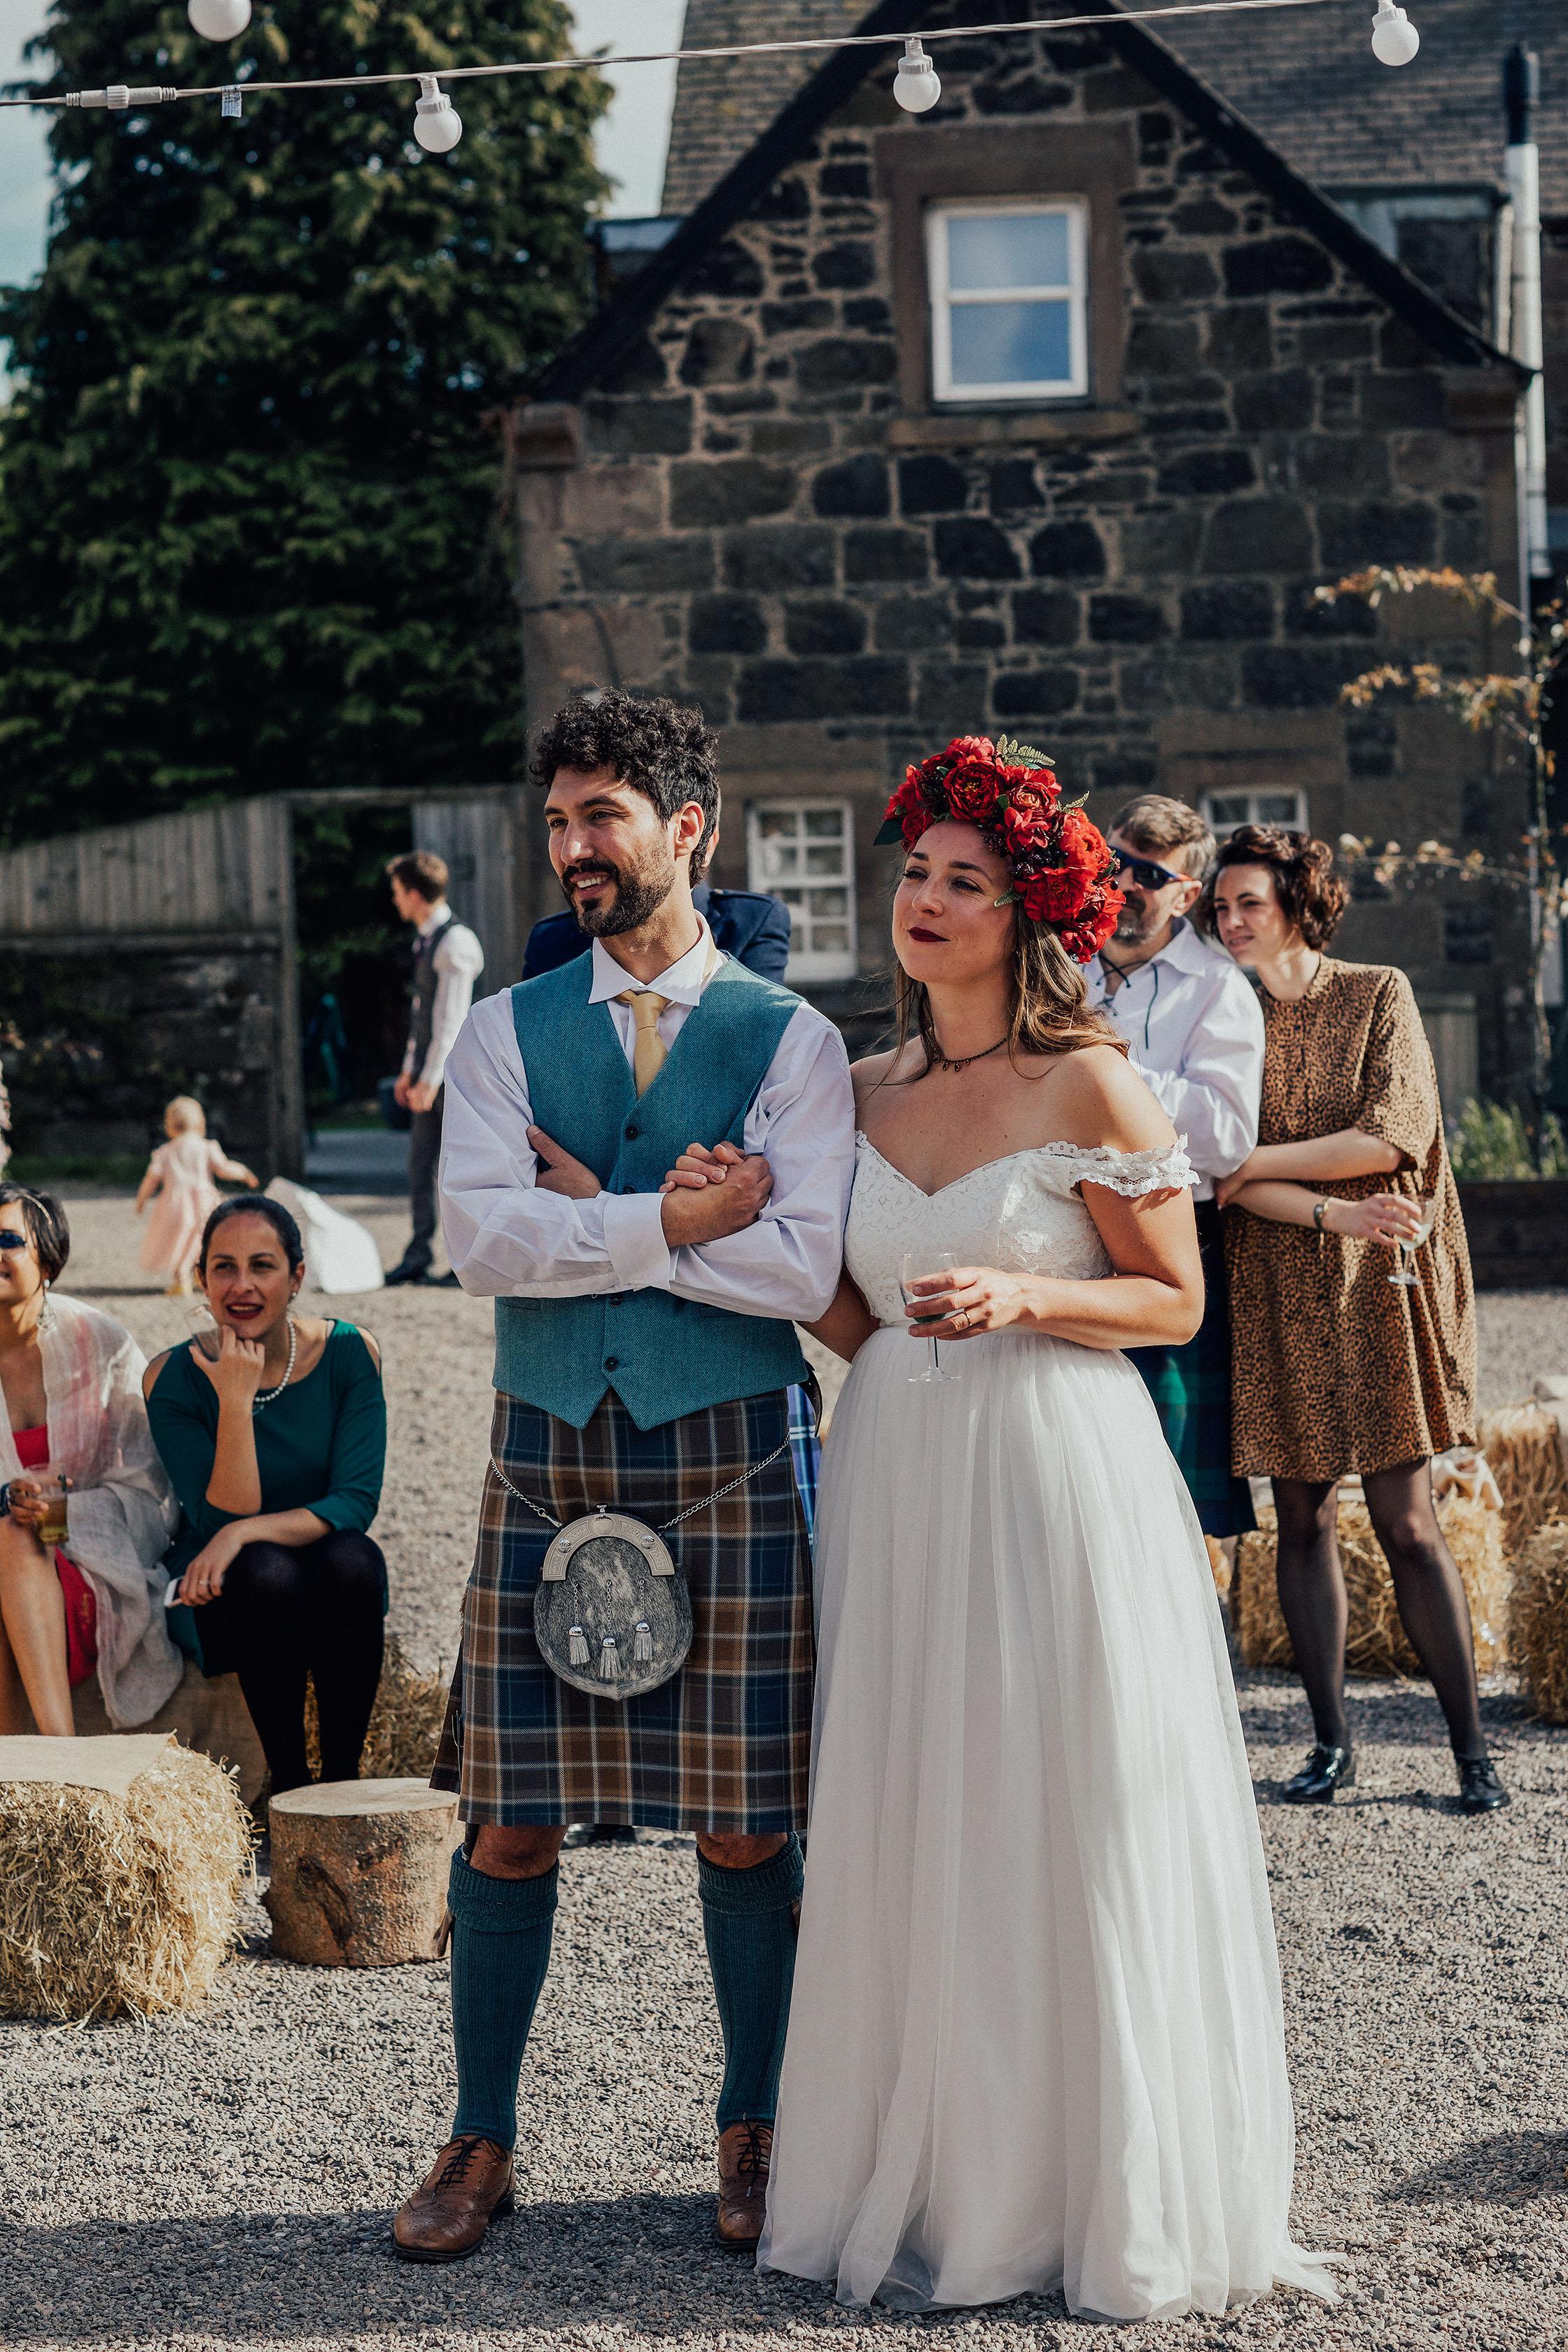 COMRIE_CROFT_WEDDINGS_PJ_PHILLIPS_PHOTOGRAPHY_137.jpg